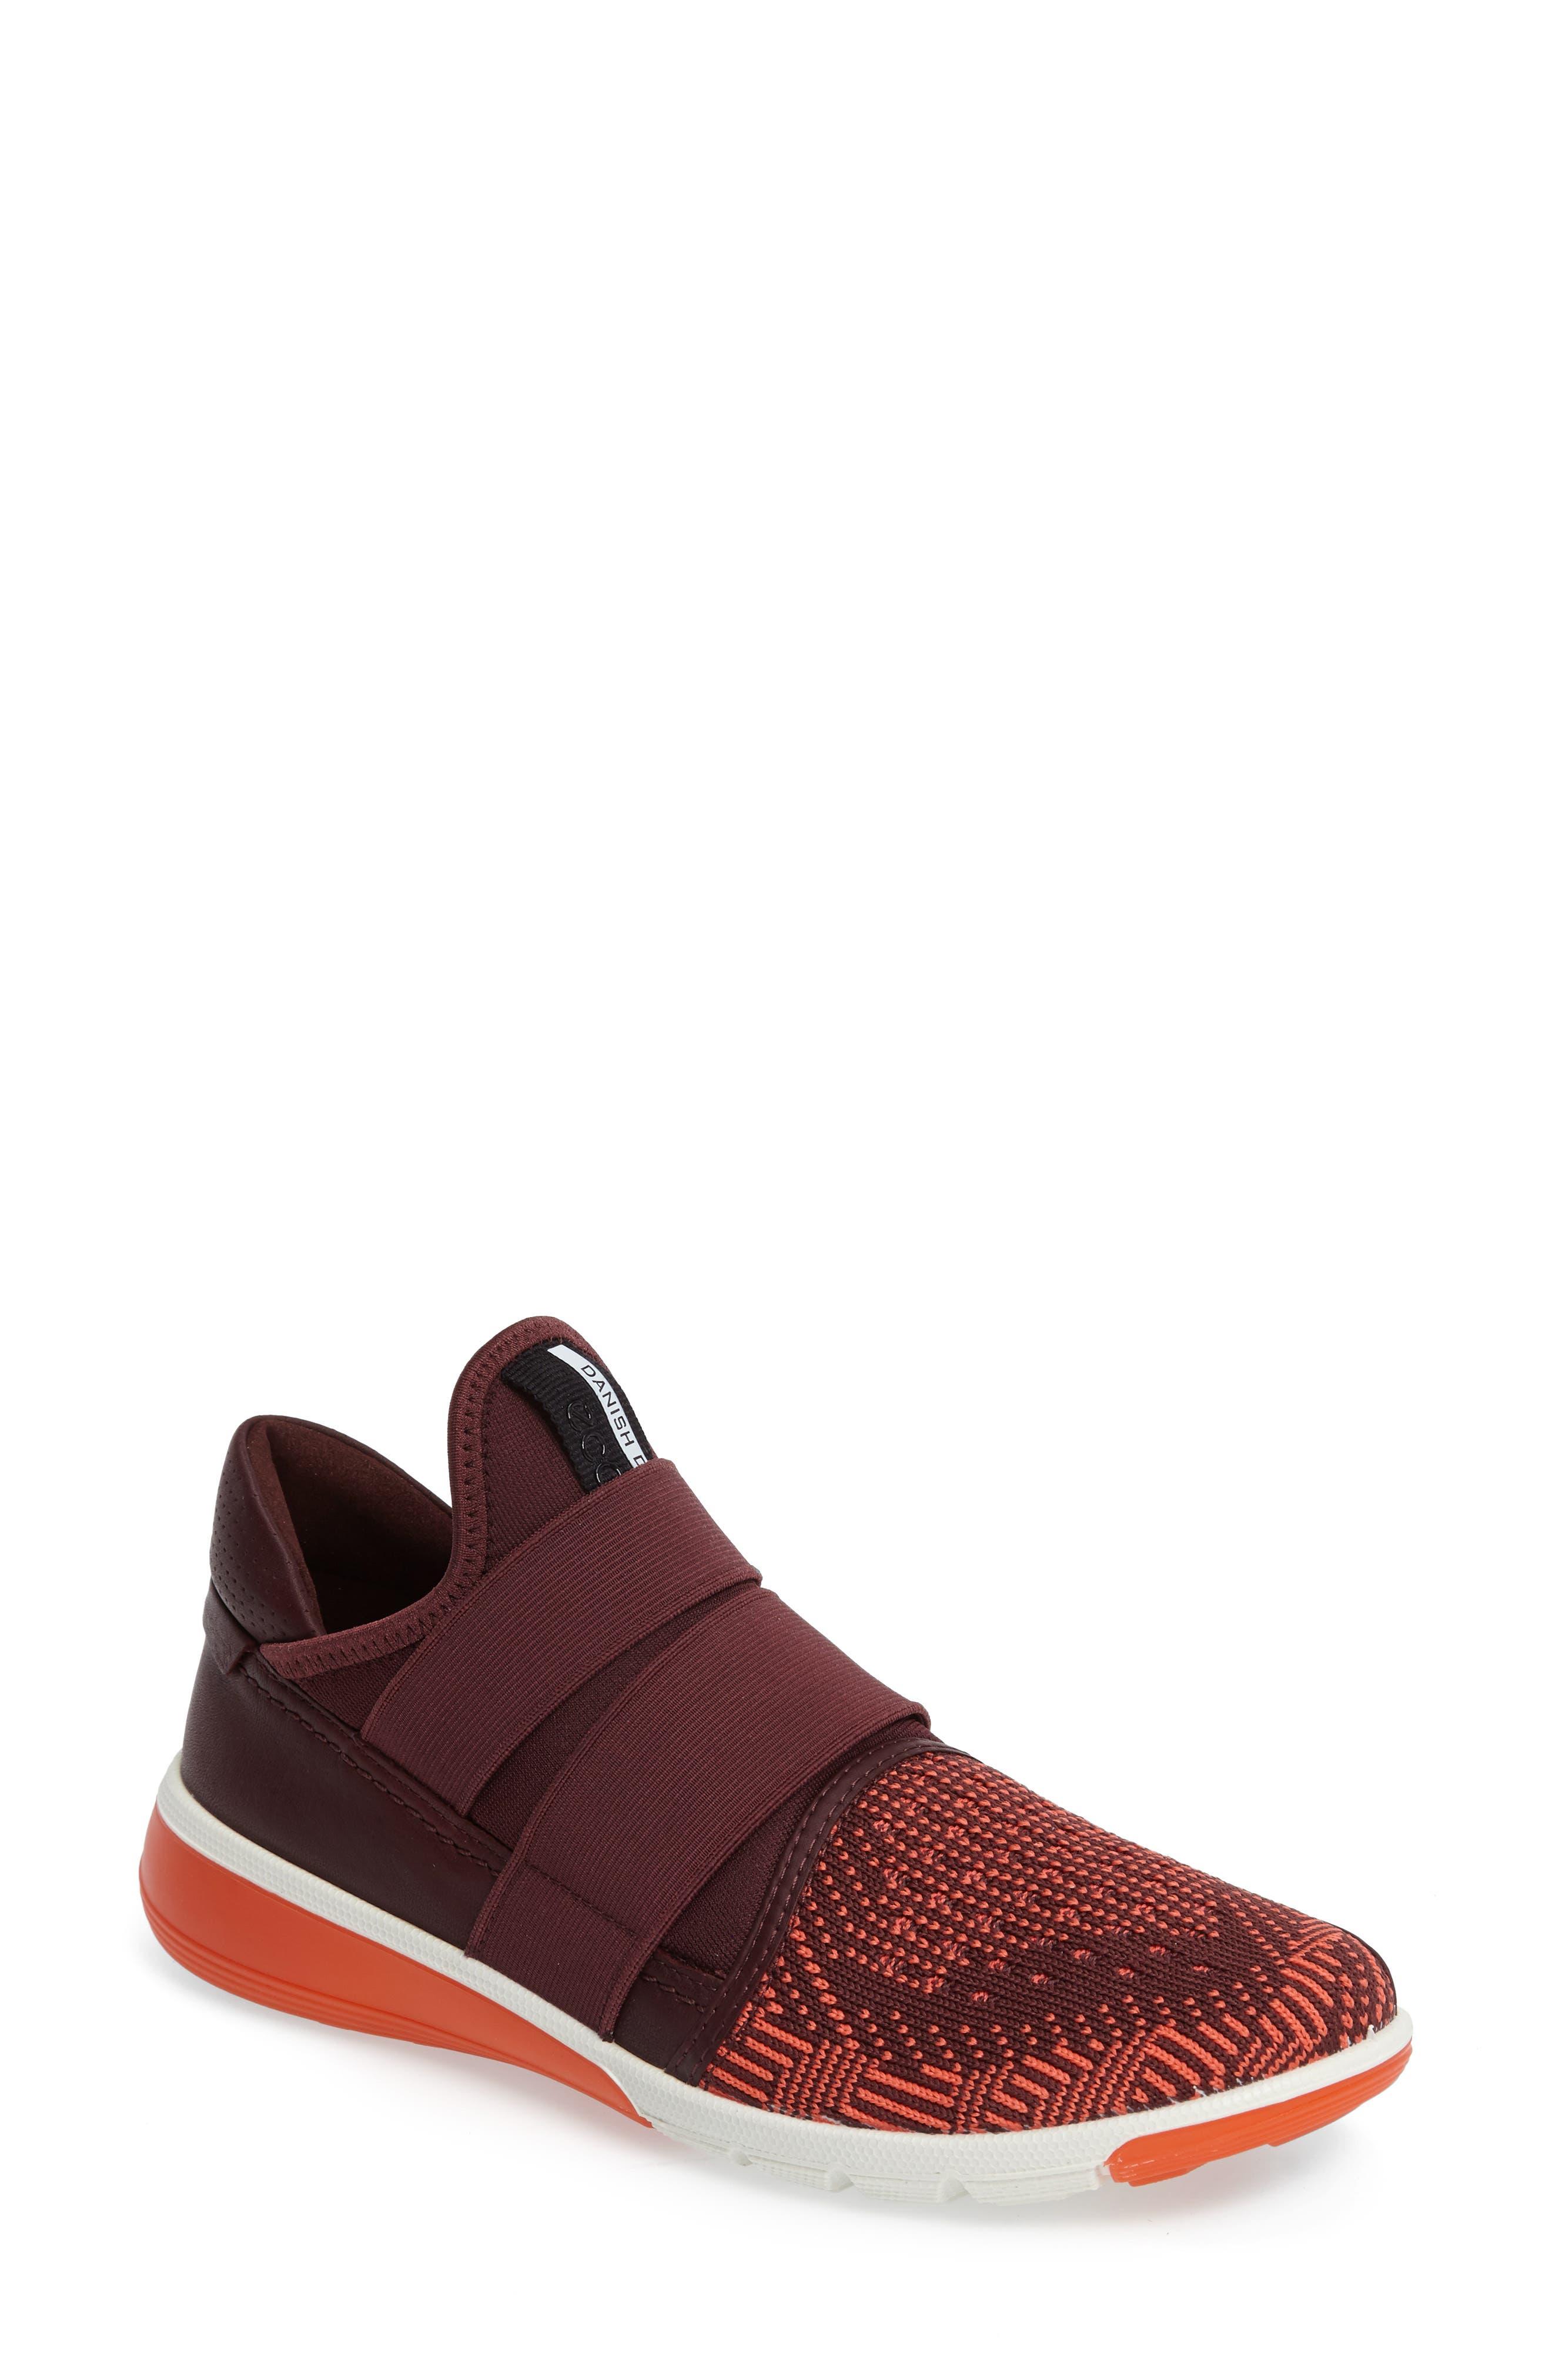 ECCO Intrinsic 2 Sneaker